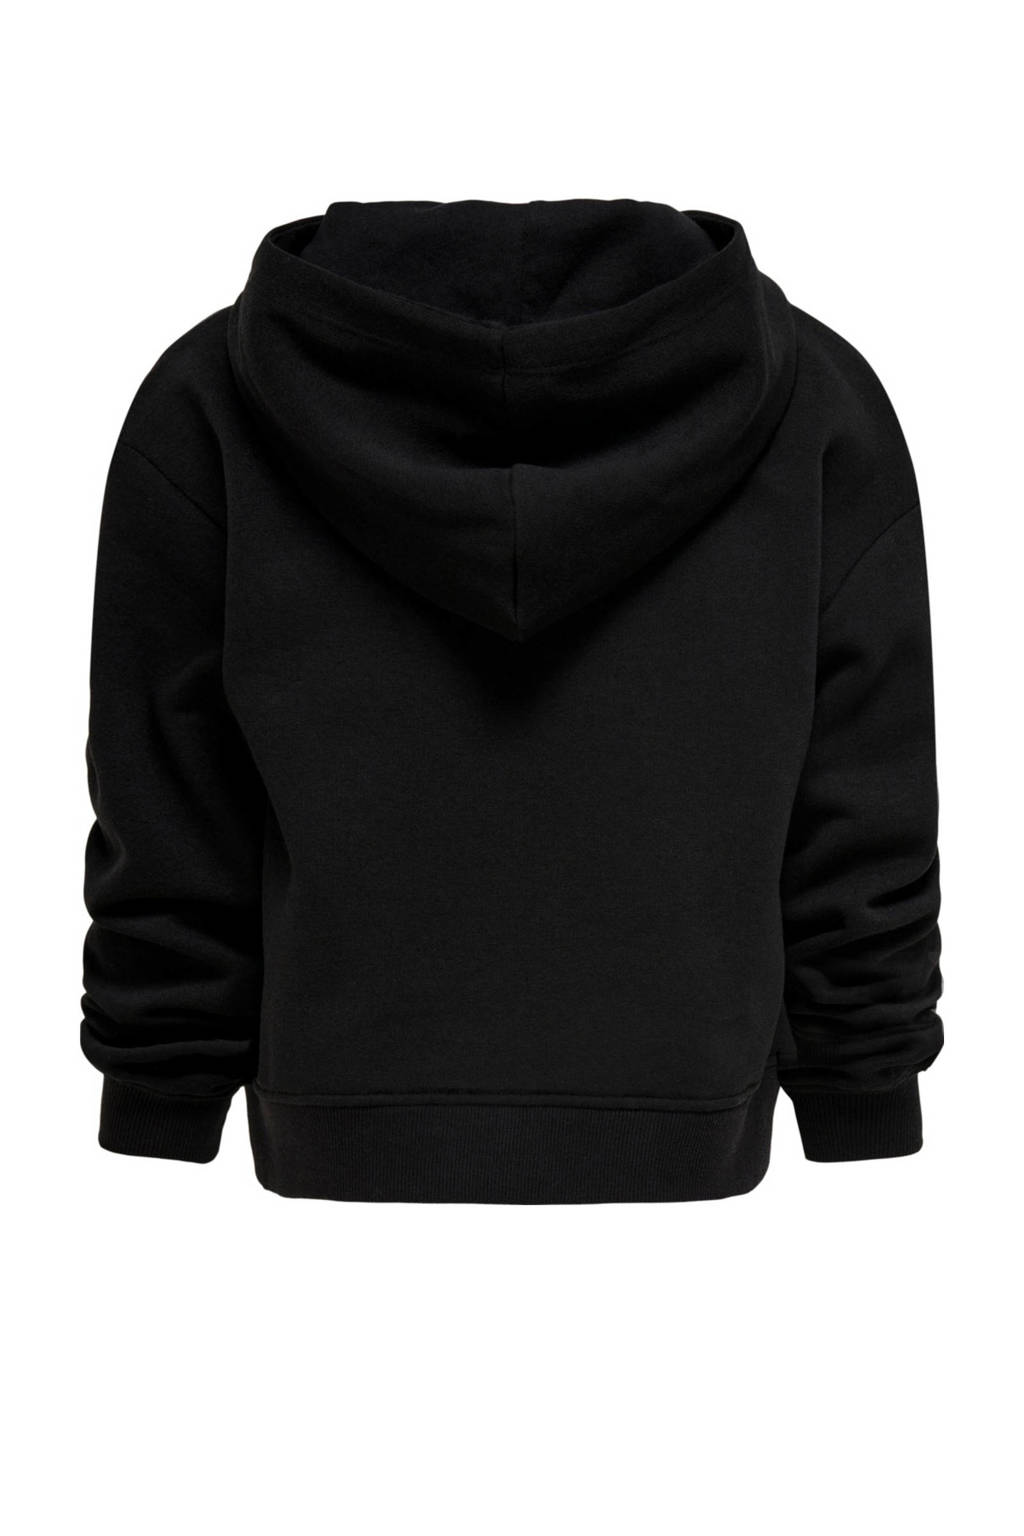 KIDS ONLY sweater College met tekst zwart/wit, Zwart/wit